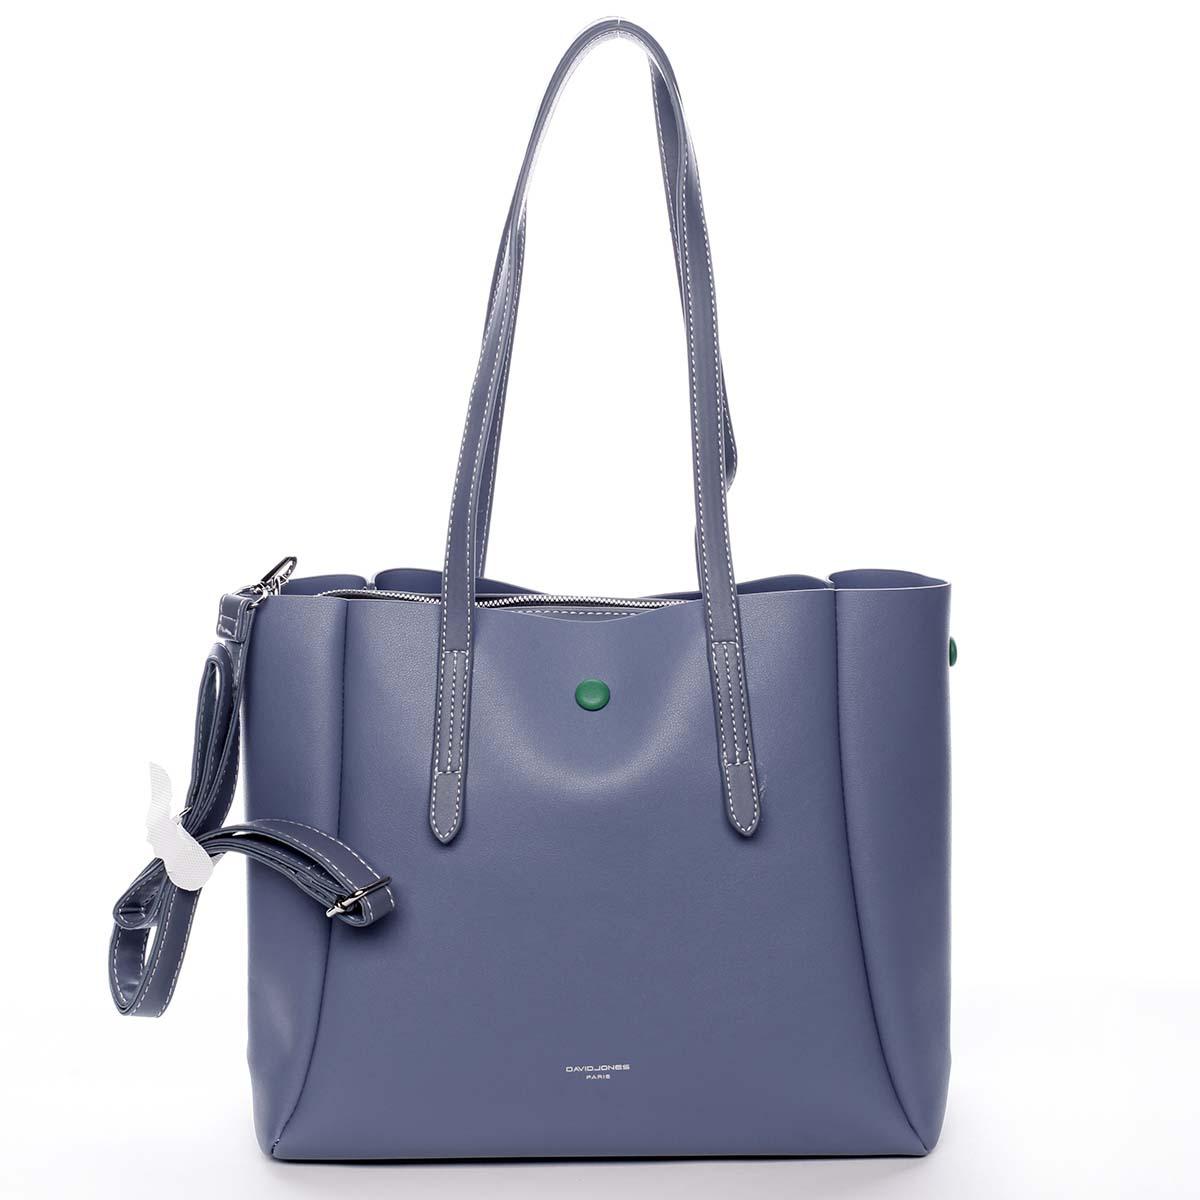 Módna dámska modrá kabelka cez rameno - David Jones Praline modrá